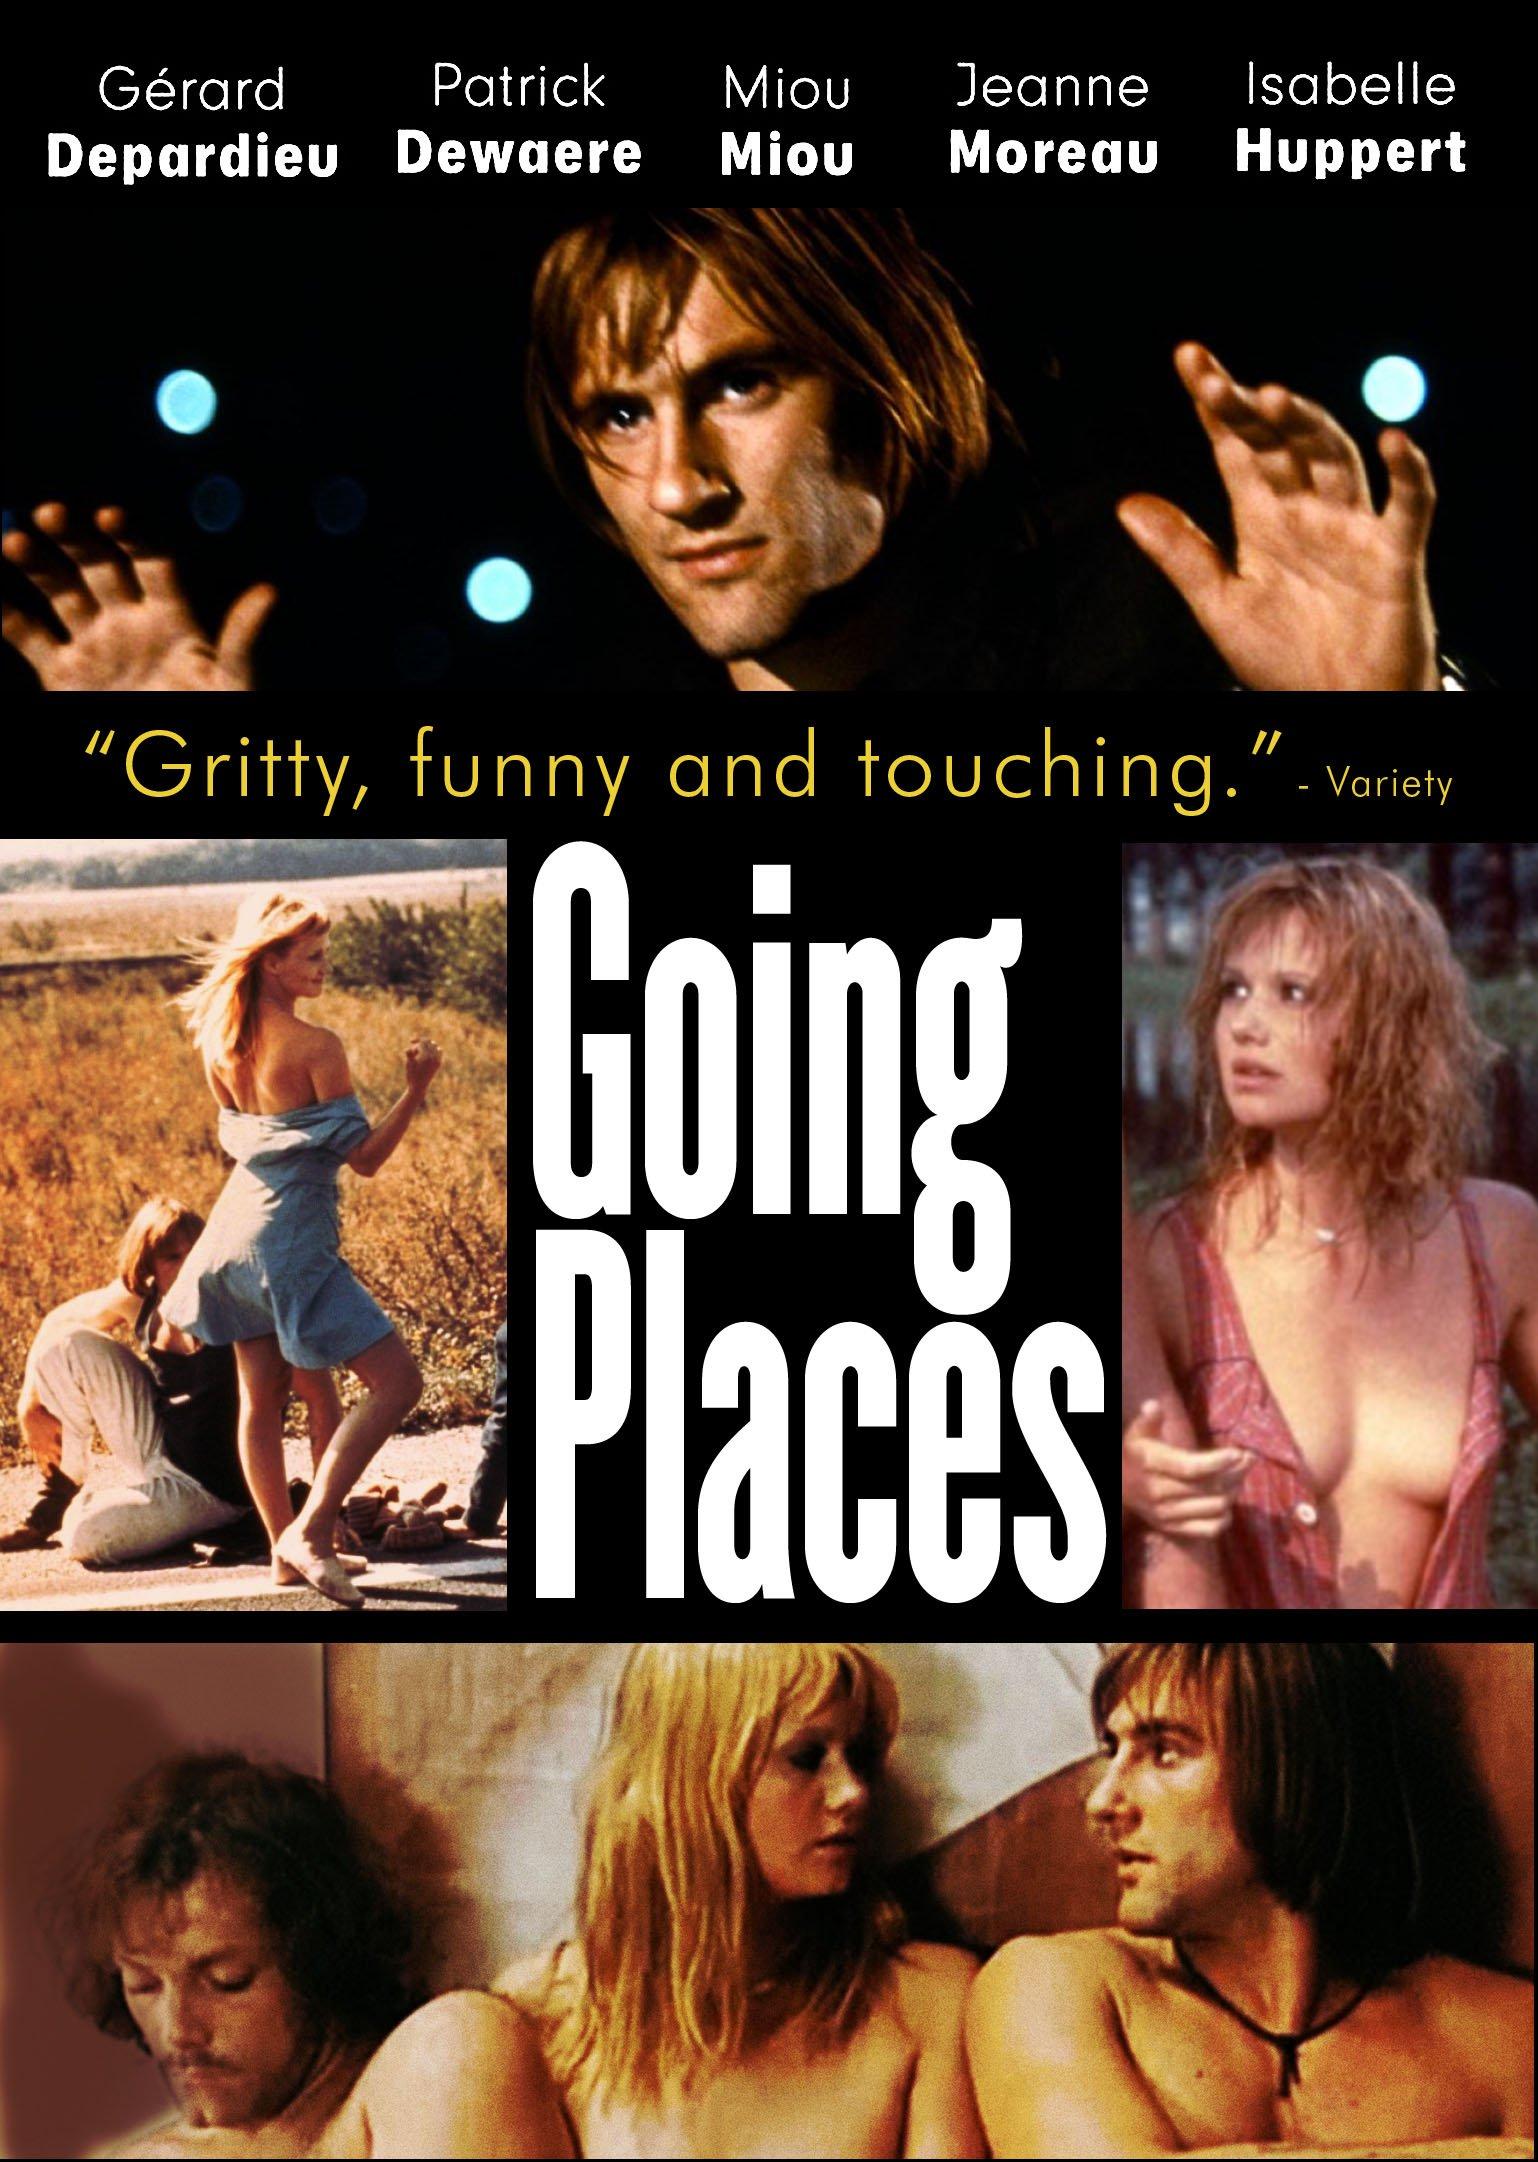 DVD : Gérard Depardieu - Going Places (Subtitled)